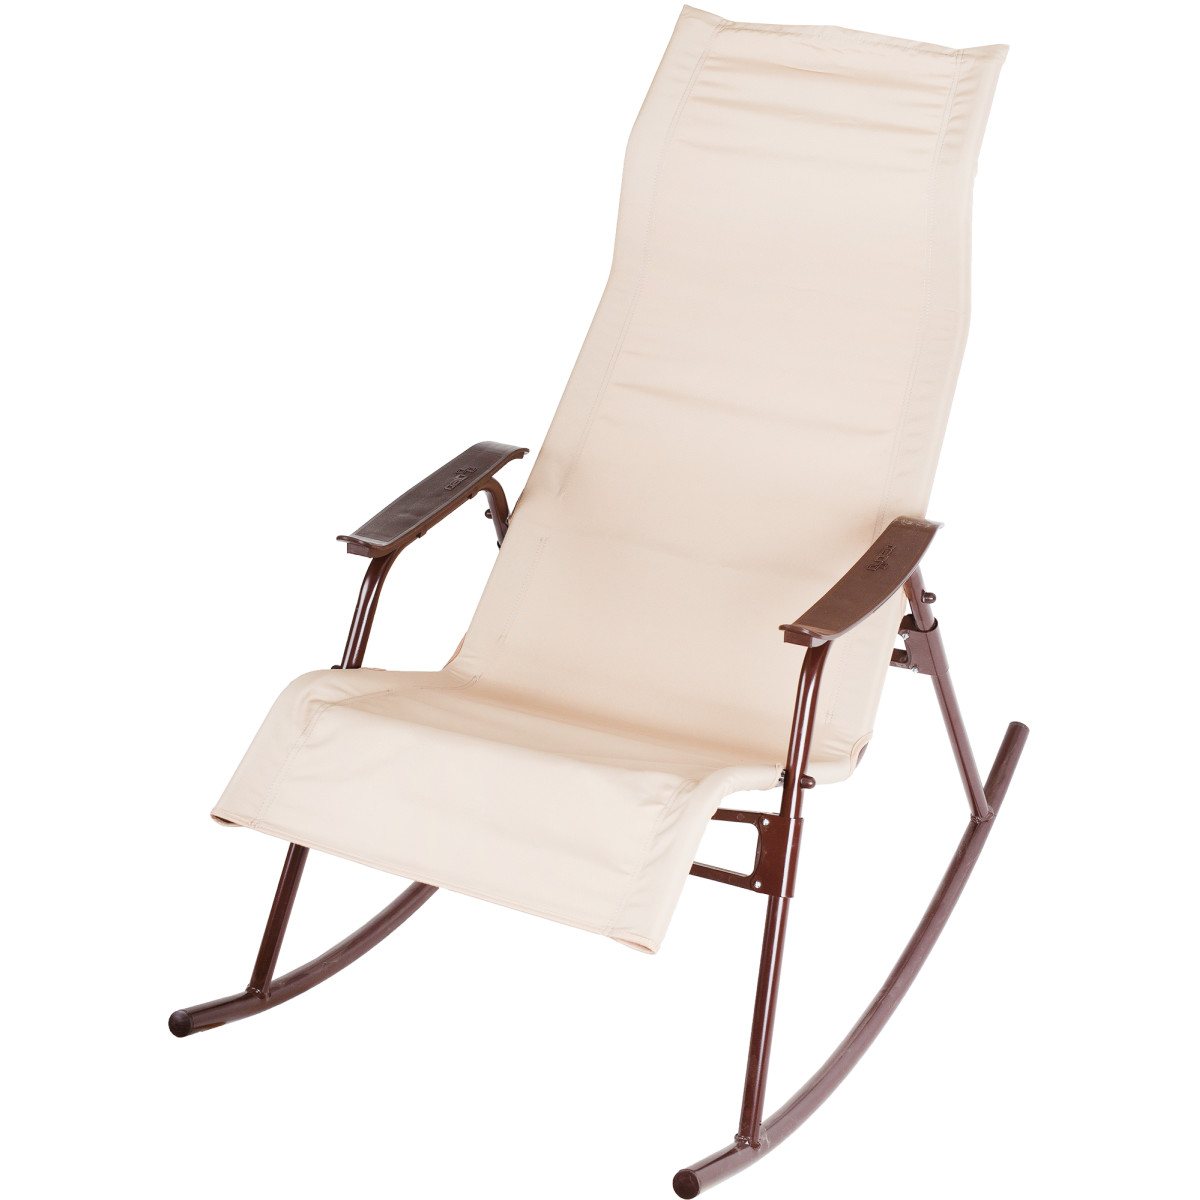 Кресло-качалка Нарочь 110х62х94 см металл коричневый/бежевый